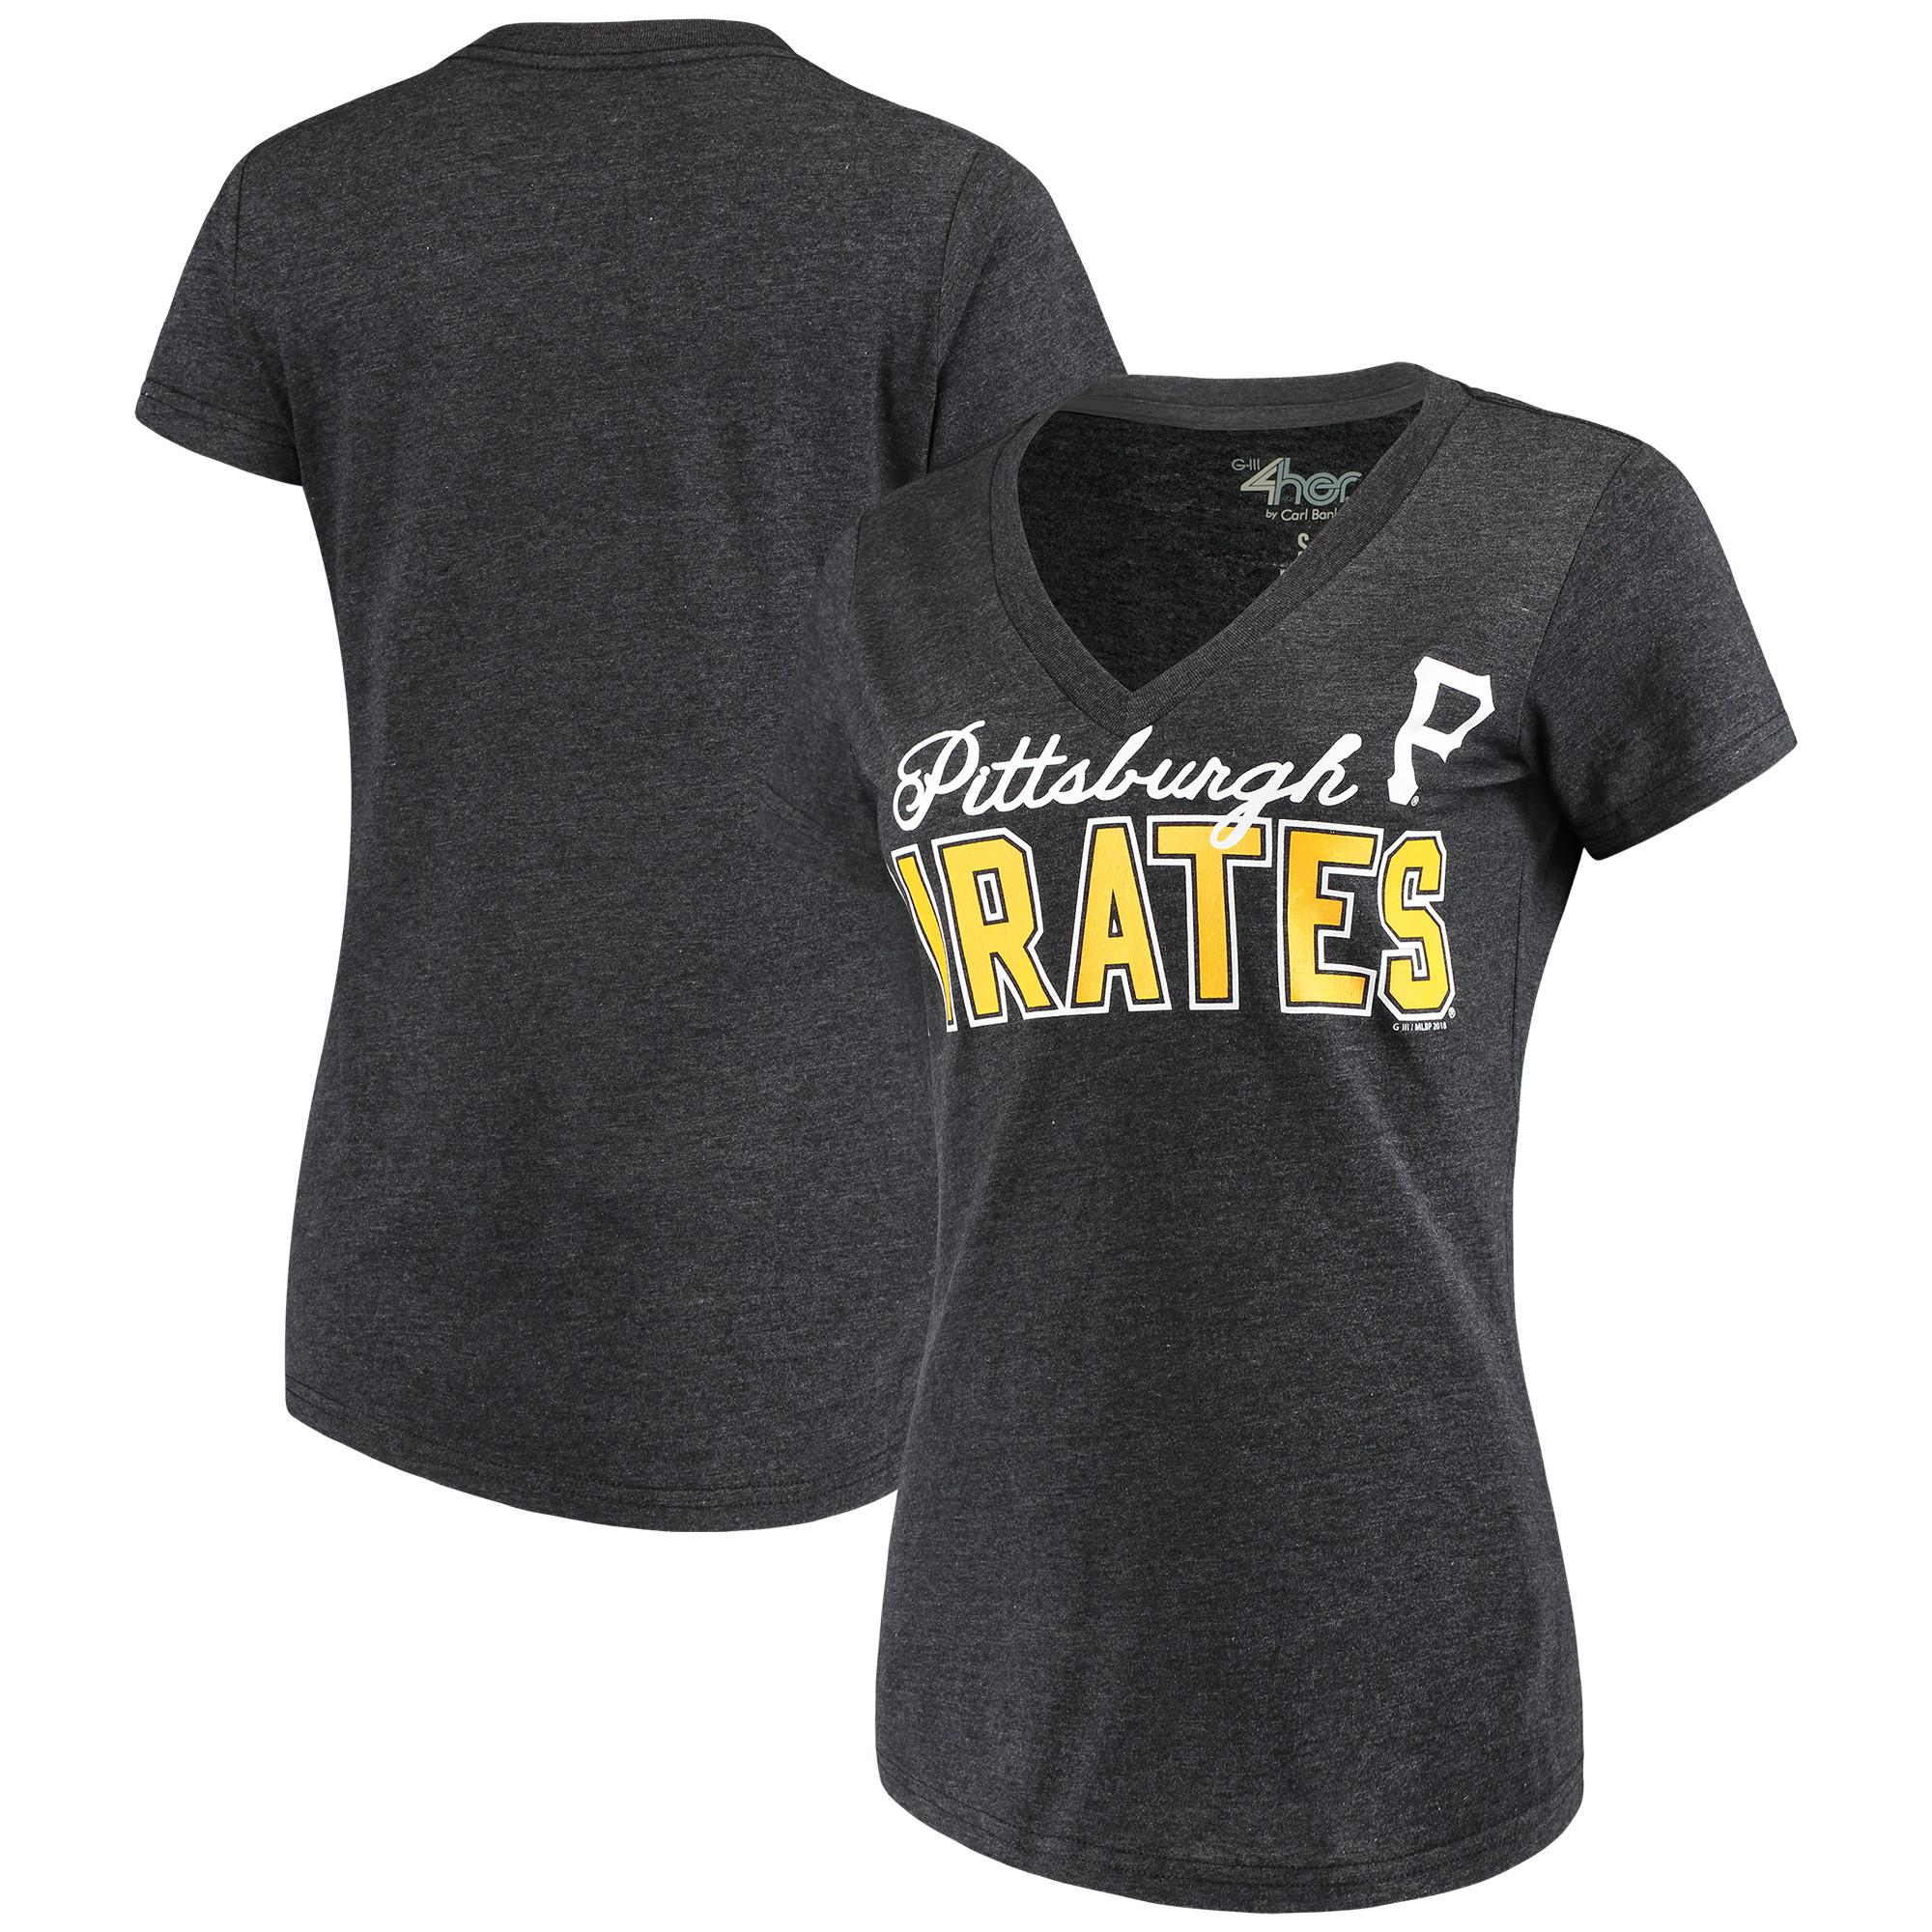 Pittsburgh Pirates G-III 4Her by Carl Banks Women's Home Run V-Neck T-Shirt - Black